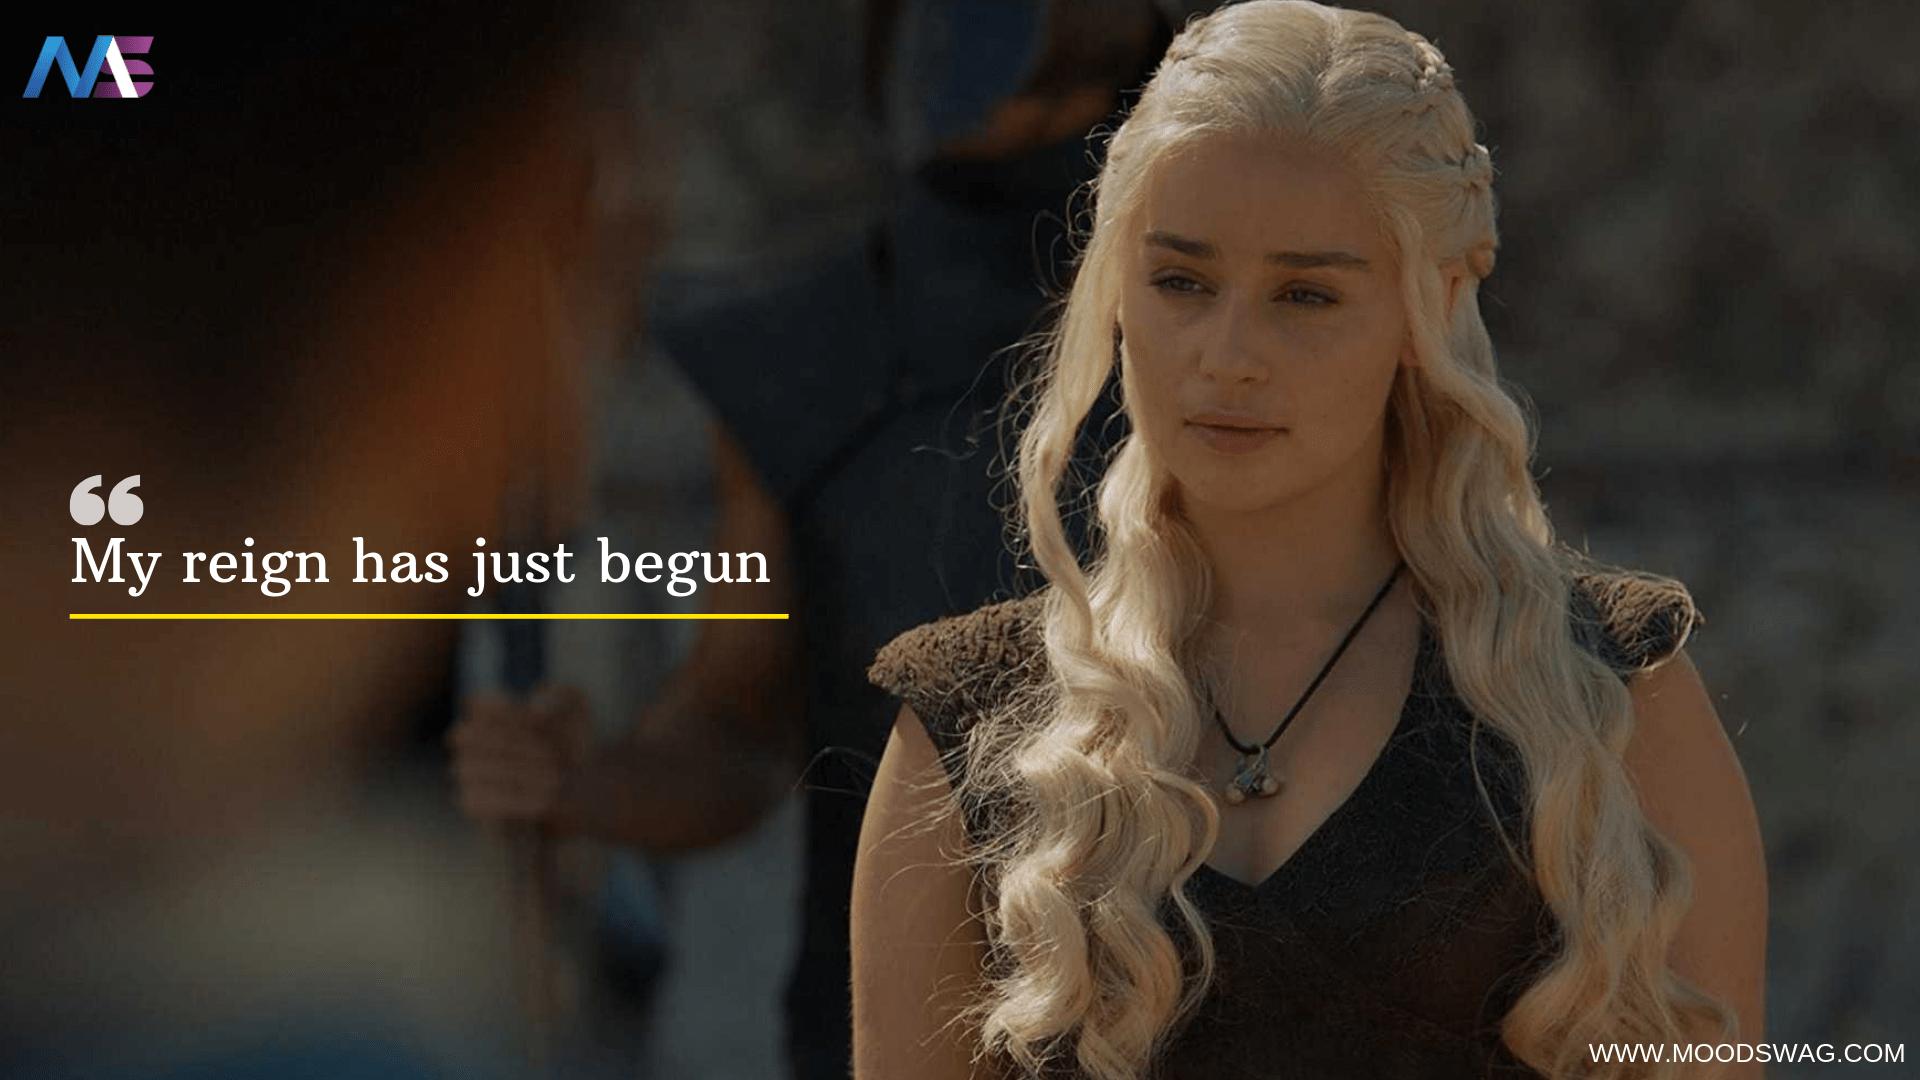 Daenerys Targaryen best quotes